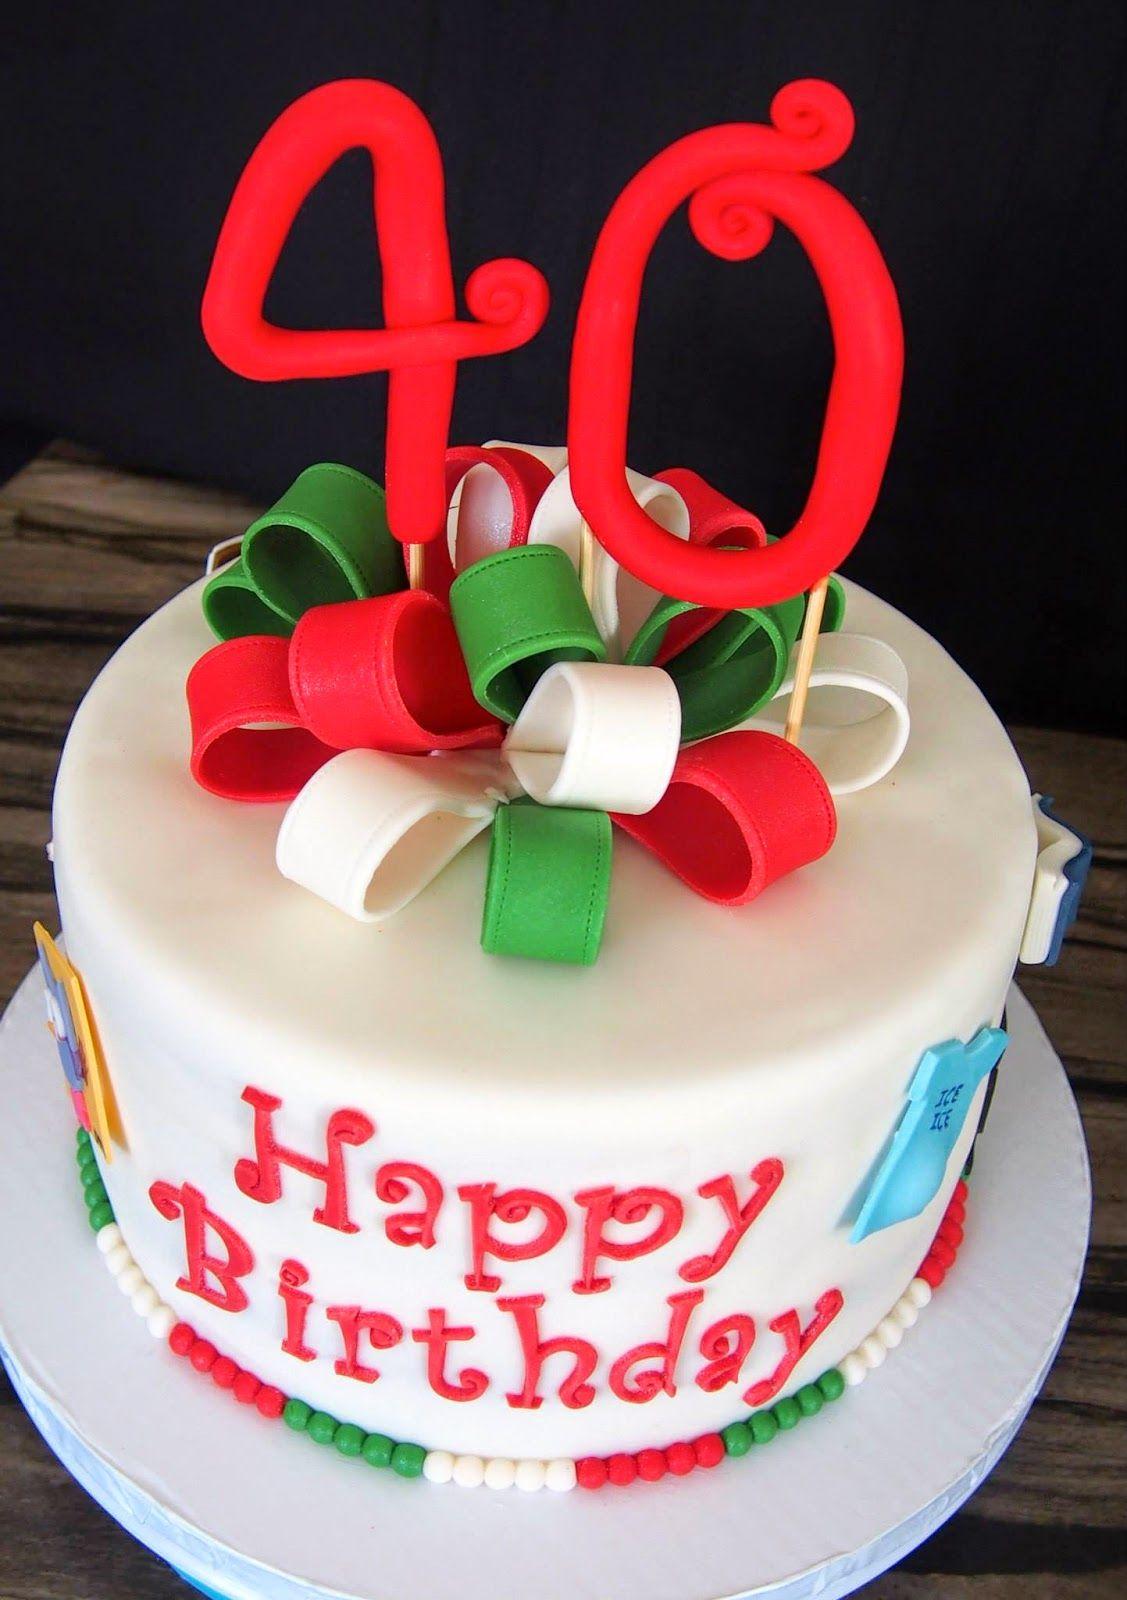 40th birthday cake 40th birthday cakes birthday cake